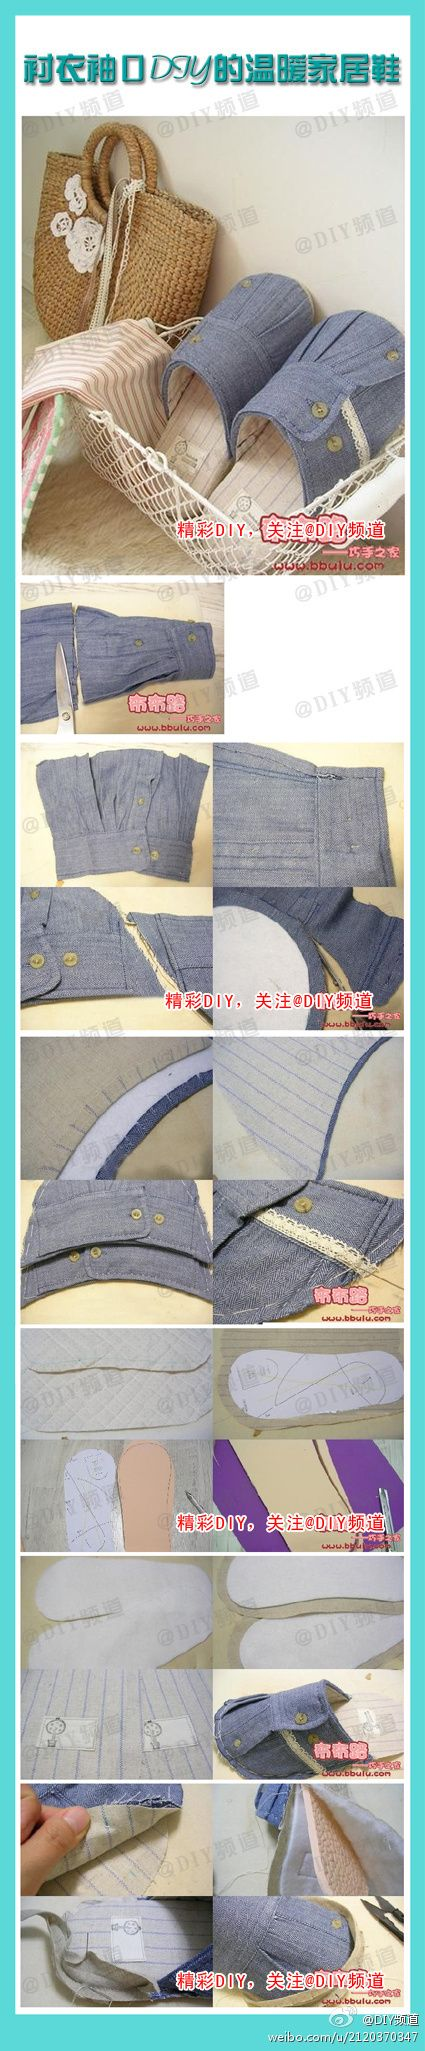 DIY cute blue slippers-easy-step by step